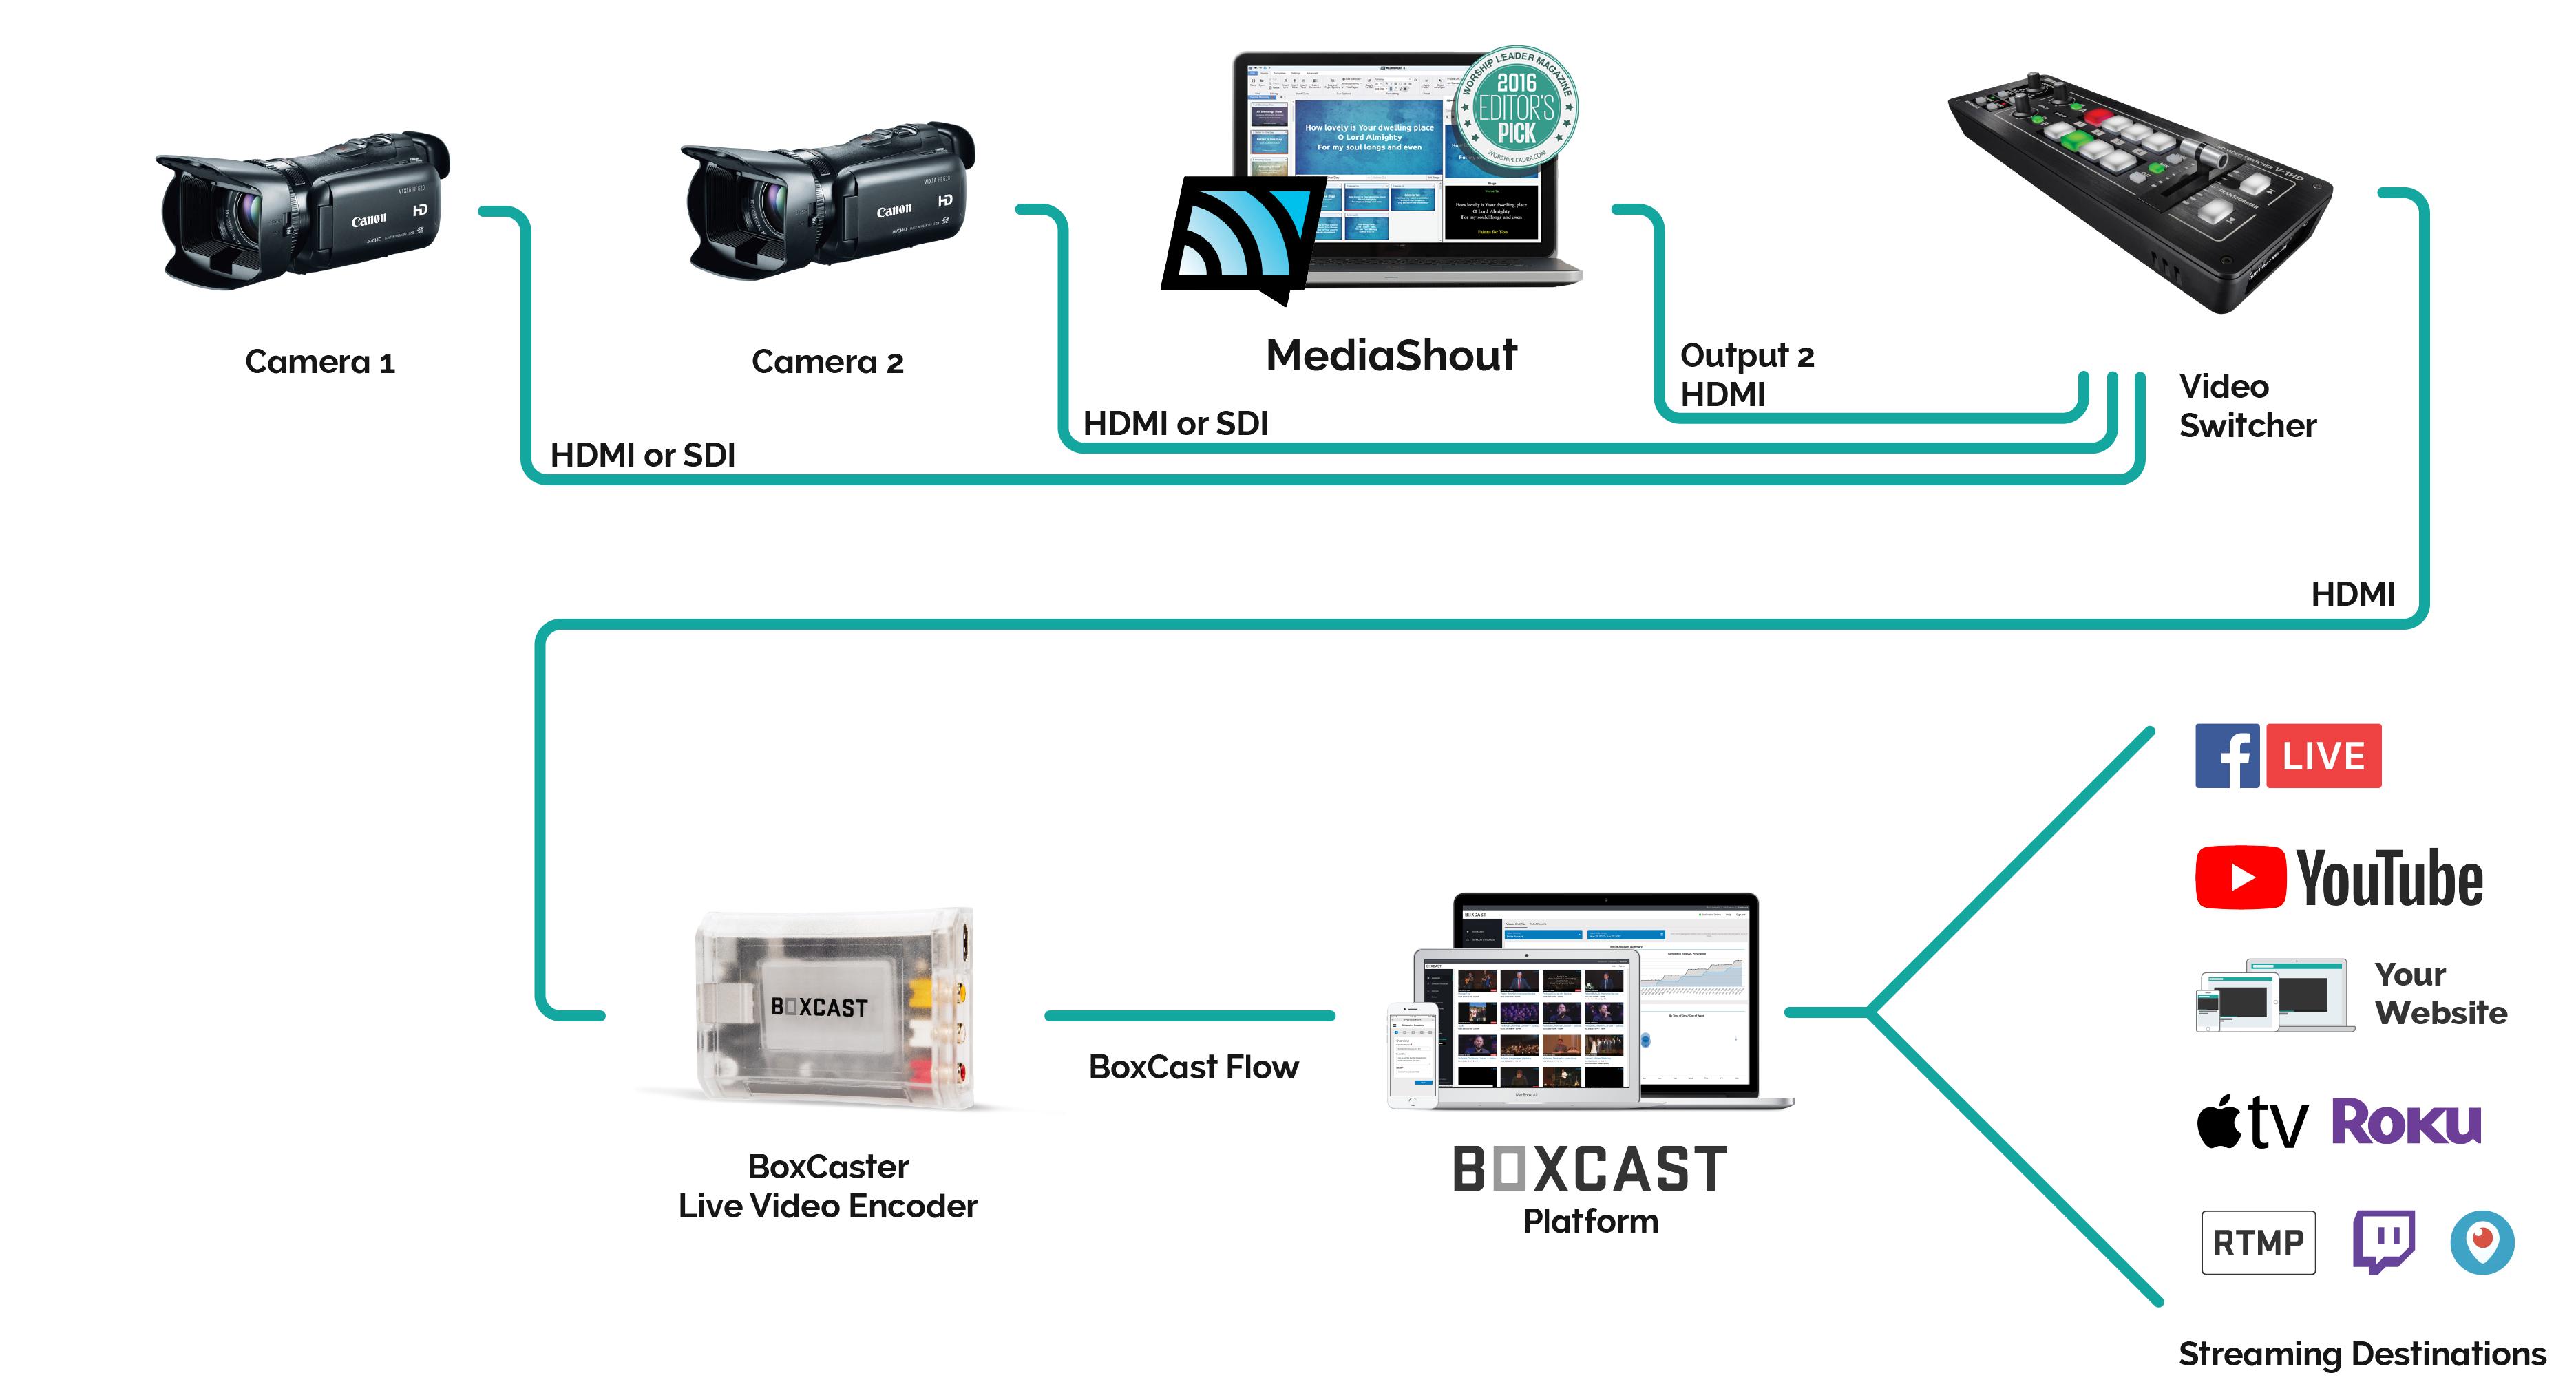 BoxCast-MediaShout-Integration